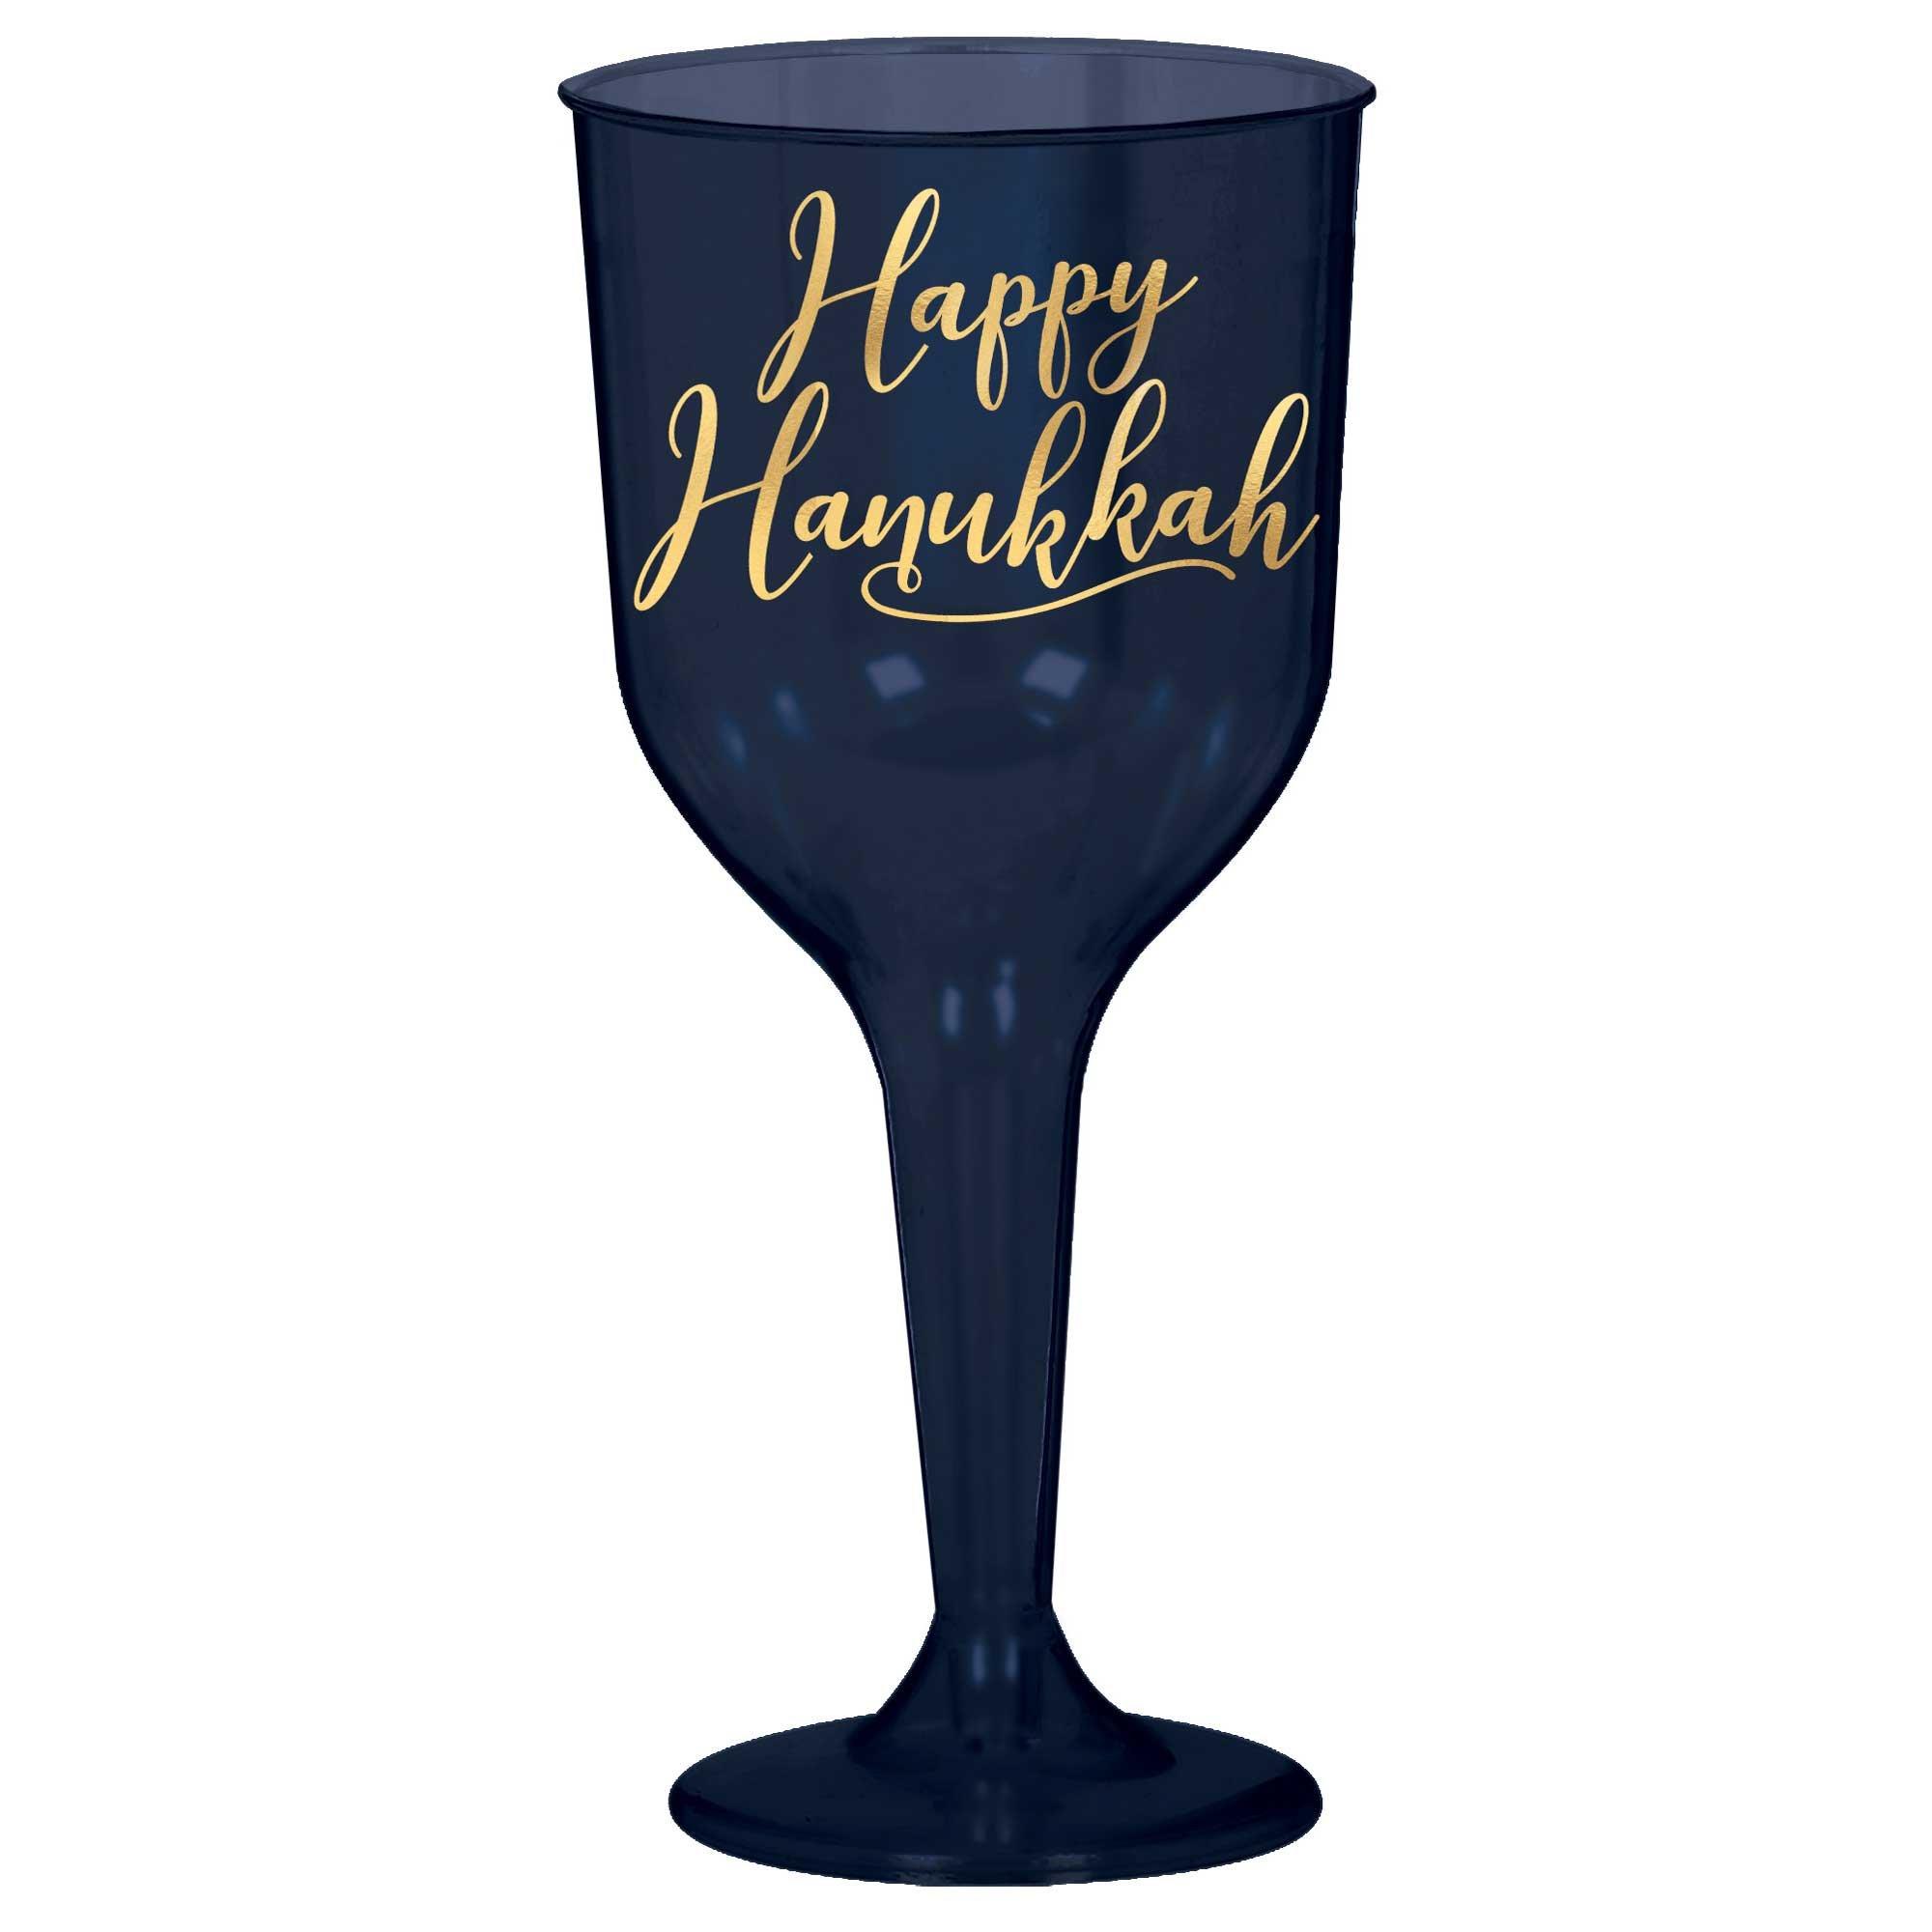 Hanukkah Plastic Wine Glasses Hot Stamped 10oz/295ml